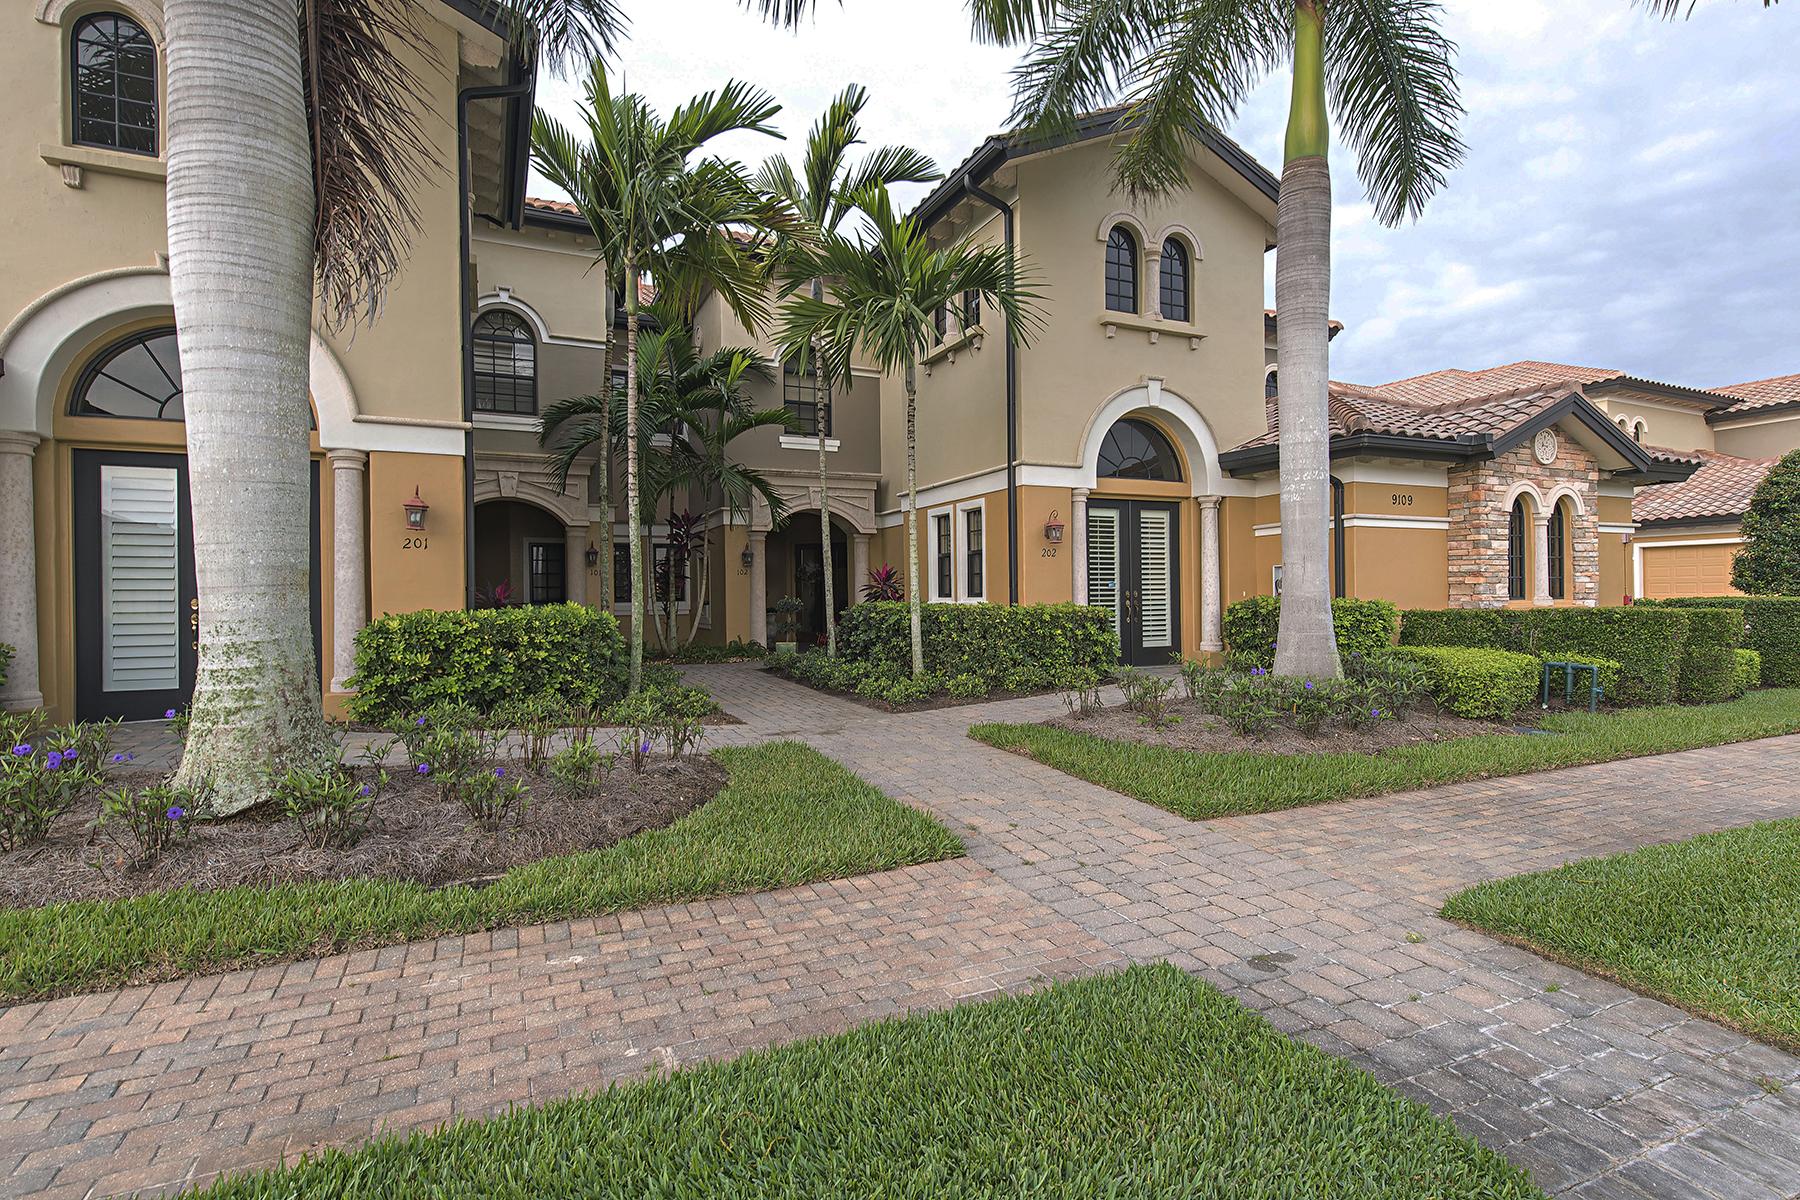 Property For Sale at TREVISO BAY - DI NAPOLI